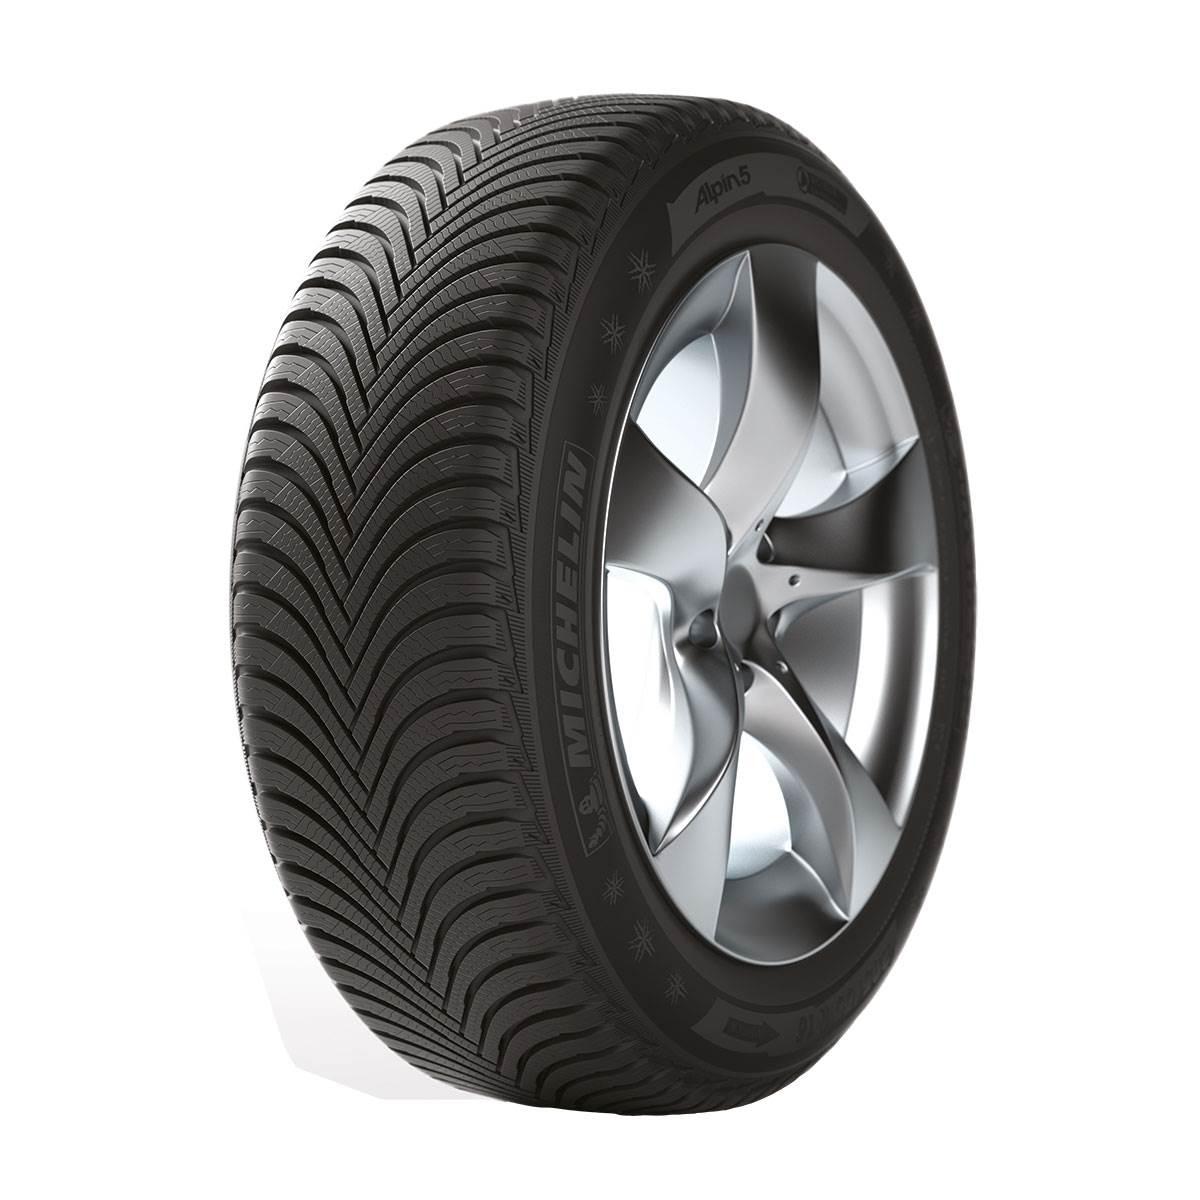 Pneu Hiver Michelin 215/55R17 98V Alpin A5 XL